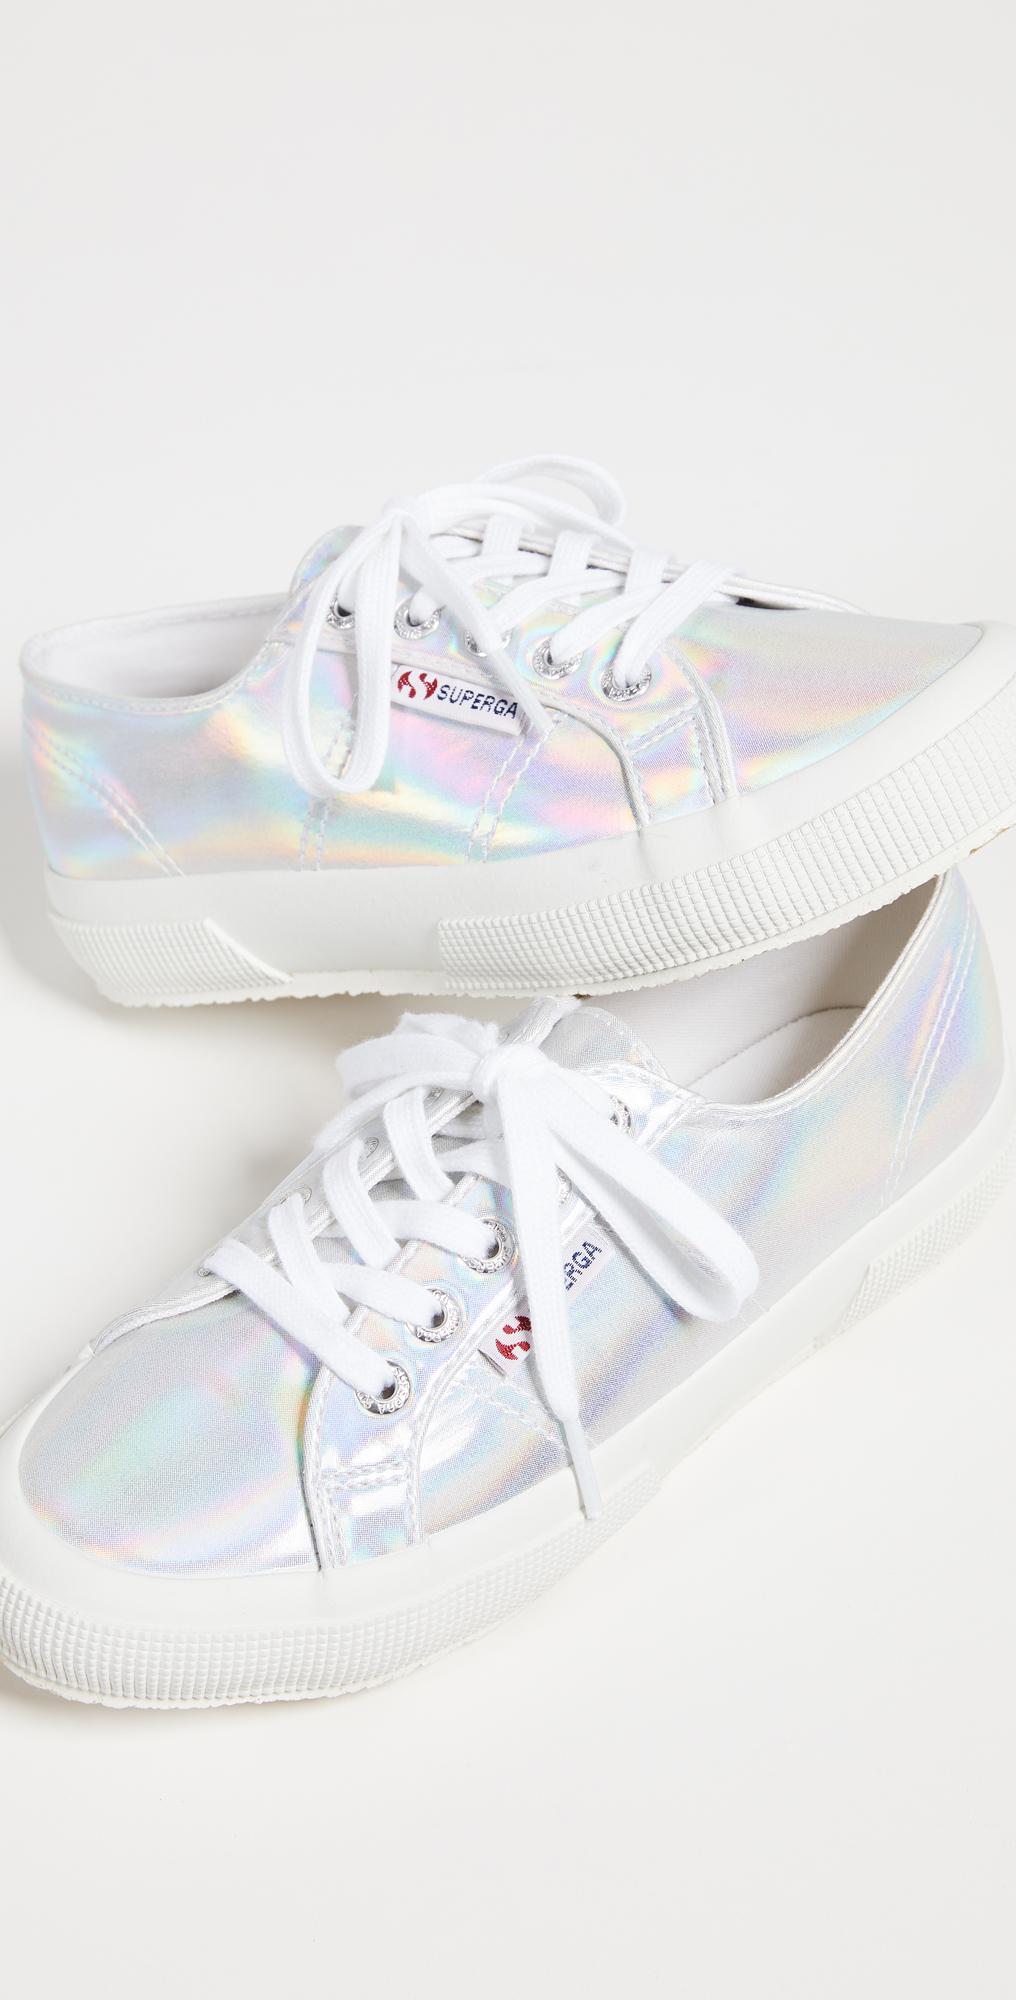 Superga 2750 Hologram Sneakers   SHOPBOP